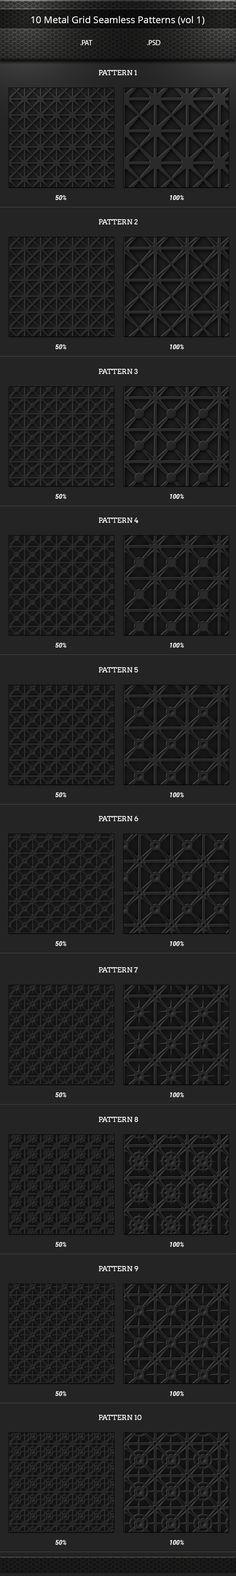 10 Metal Grid Tileable Patterns Set (vol 1)